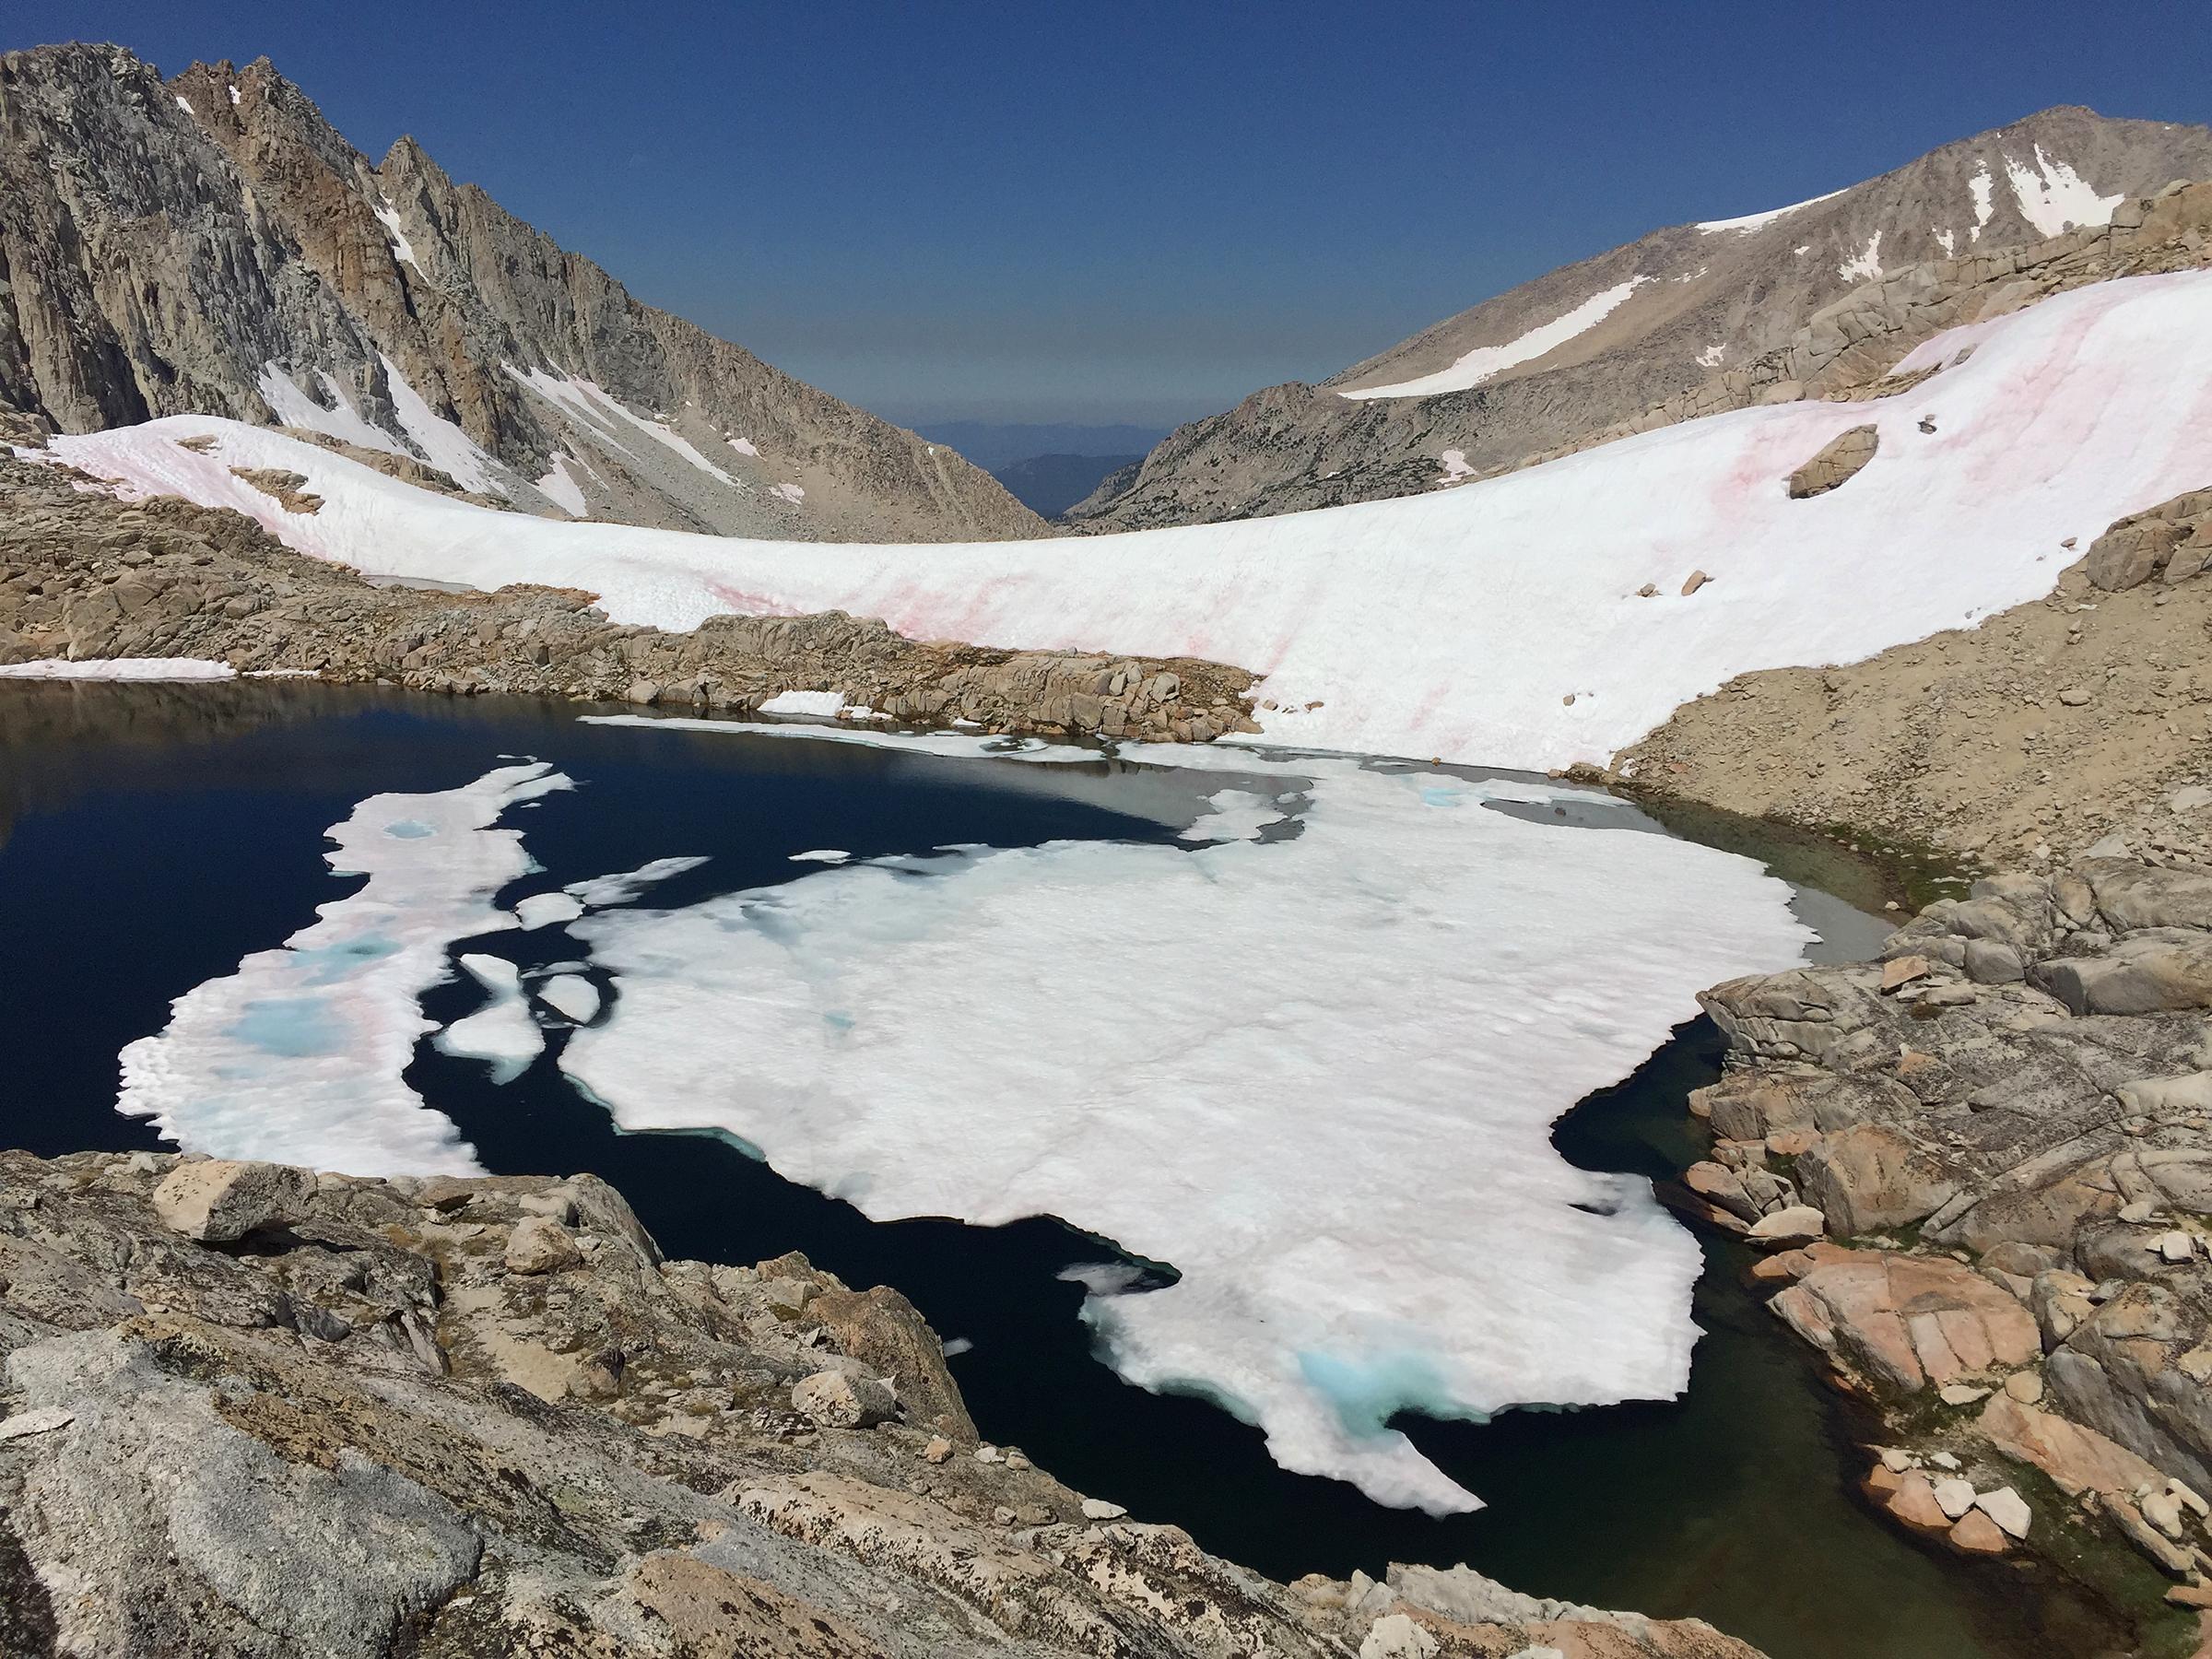 trailname-backstroke-sierra-high-route-2017_0710.jpg